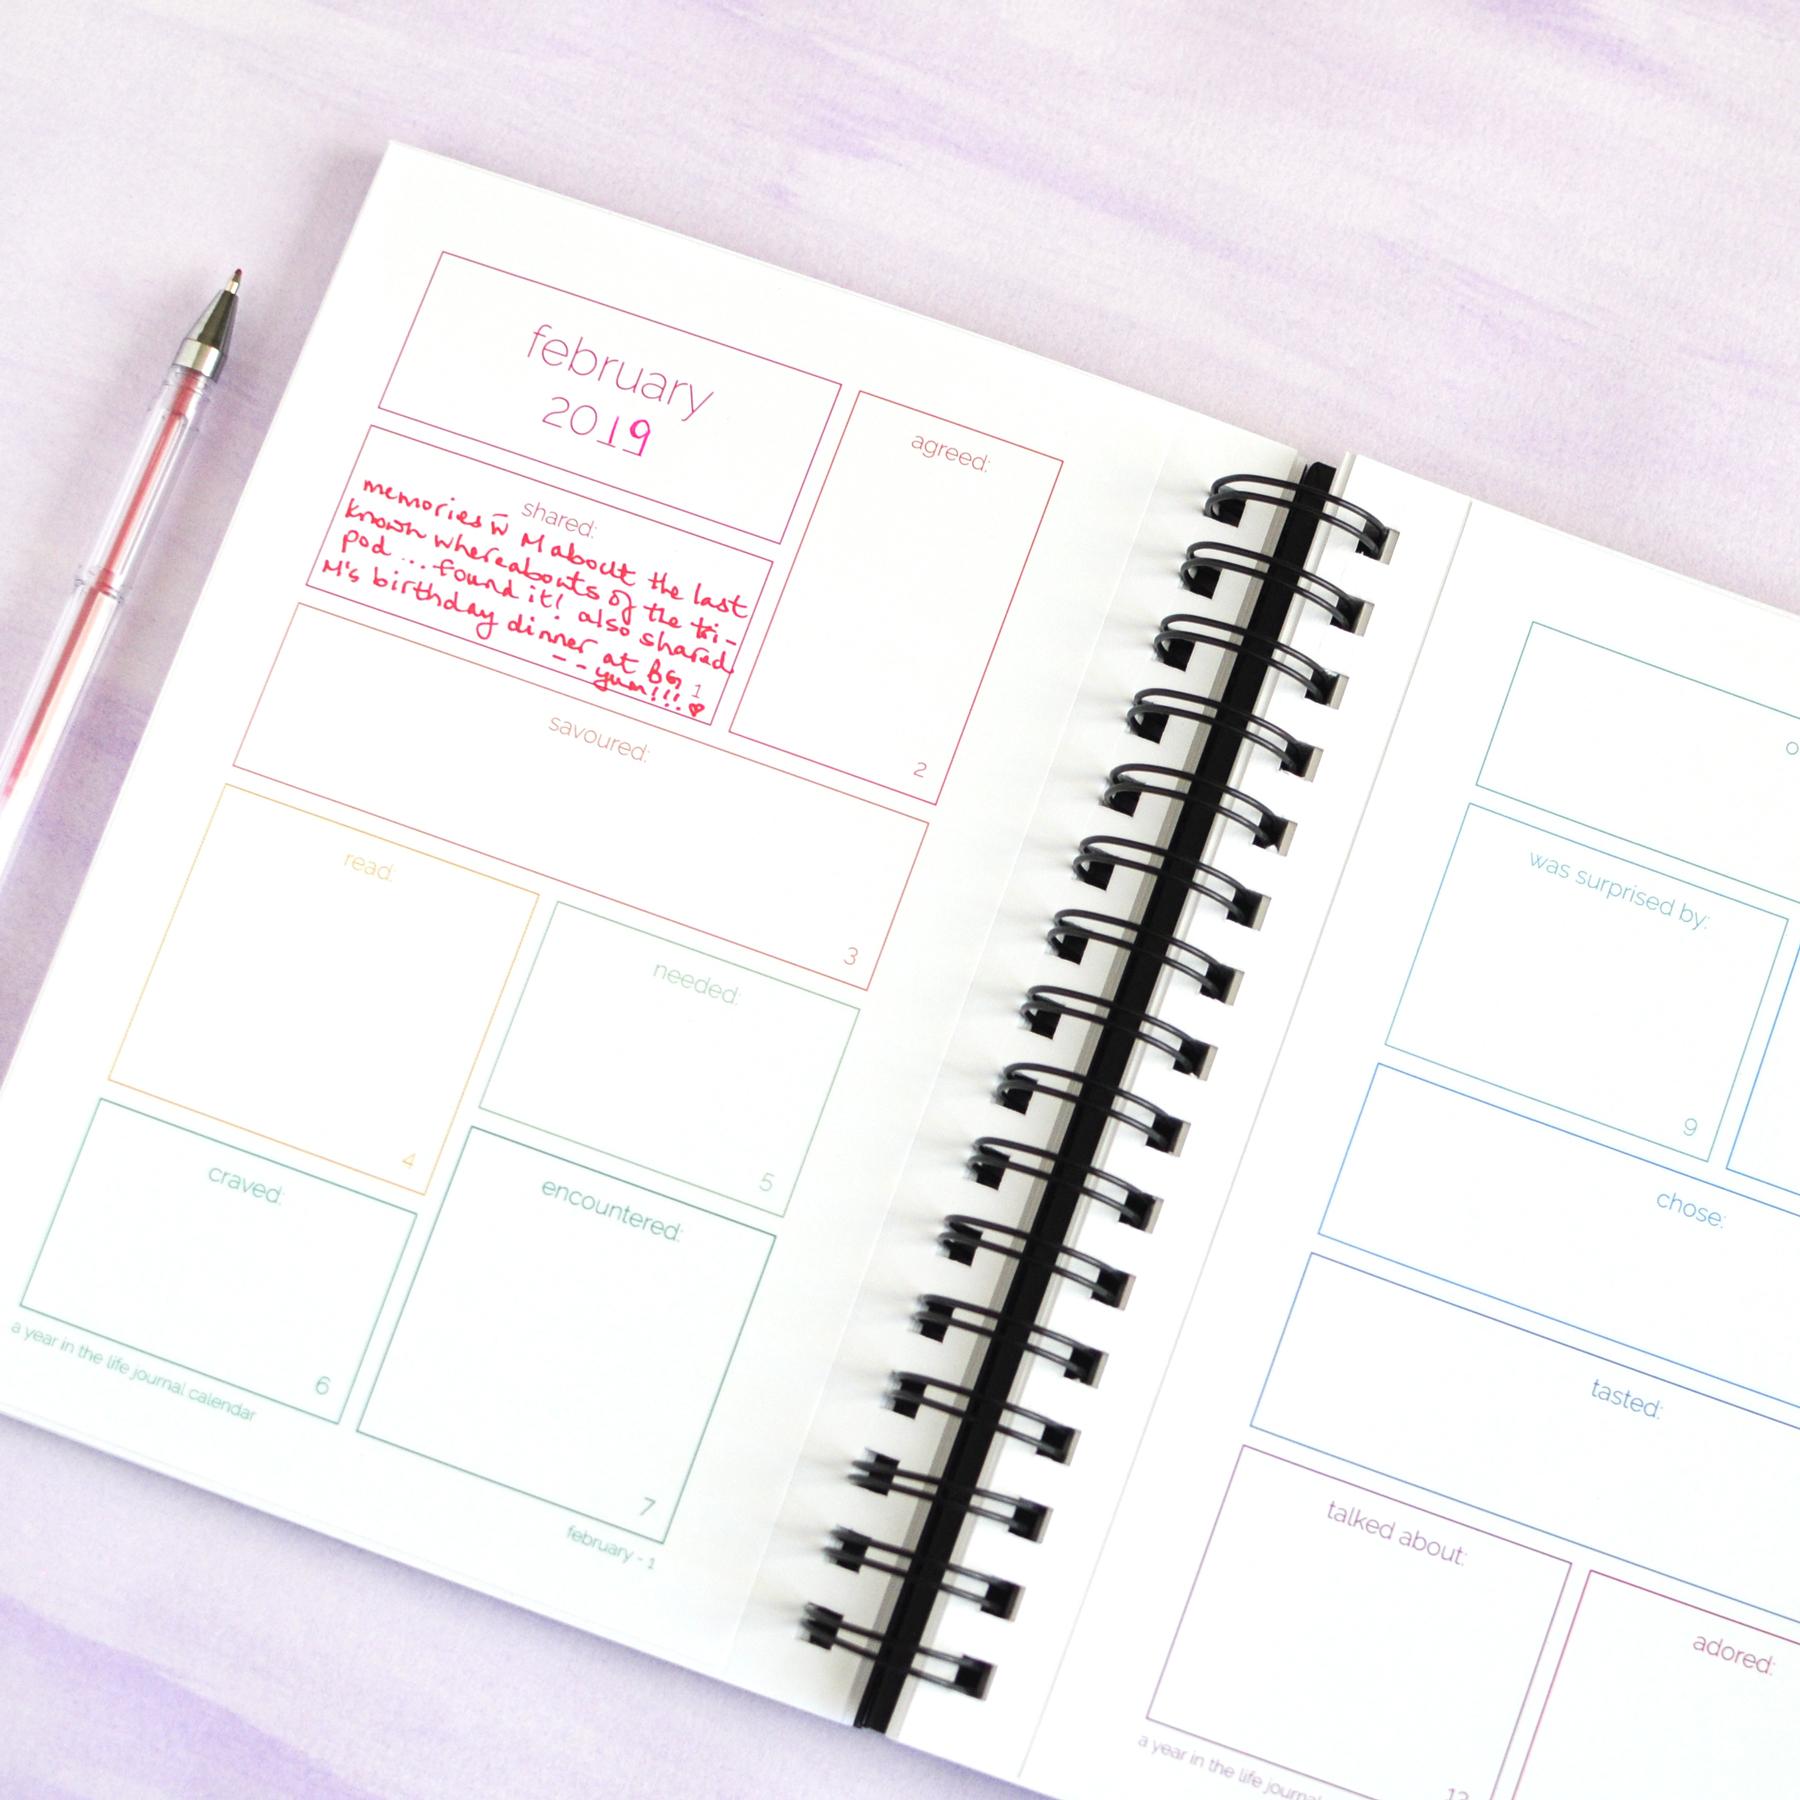 01-02-2019-Journal-Calendar-by-Christie-Zimmer.jpg